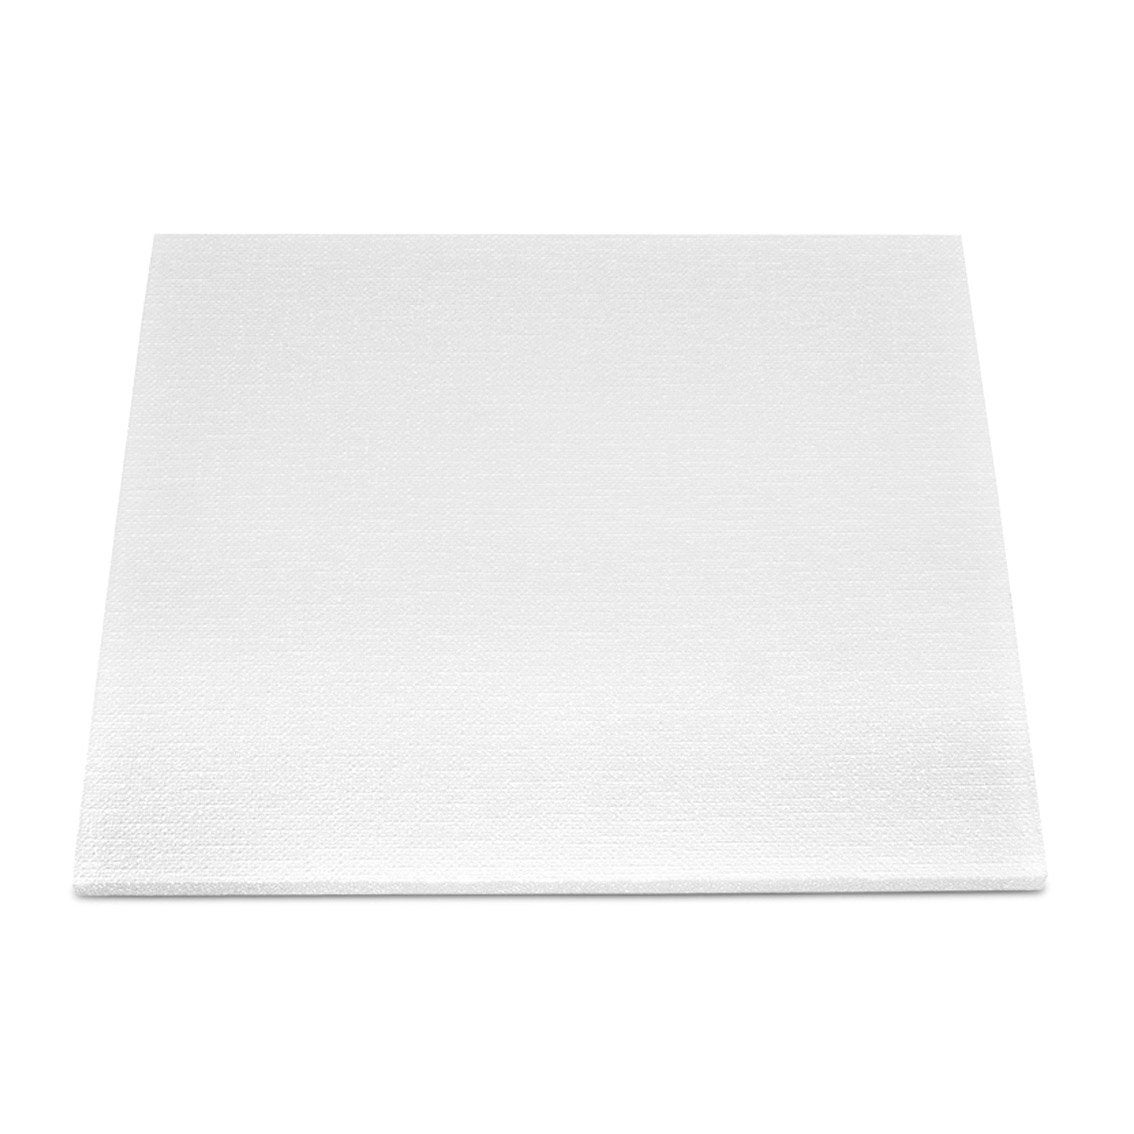 Dalle de plafond t 149 50 x 50 cm p 10 mm polystyr ne for Plaque polystyrene leroy merlin